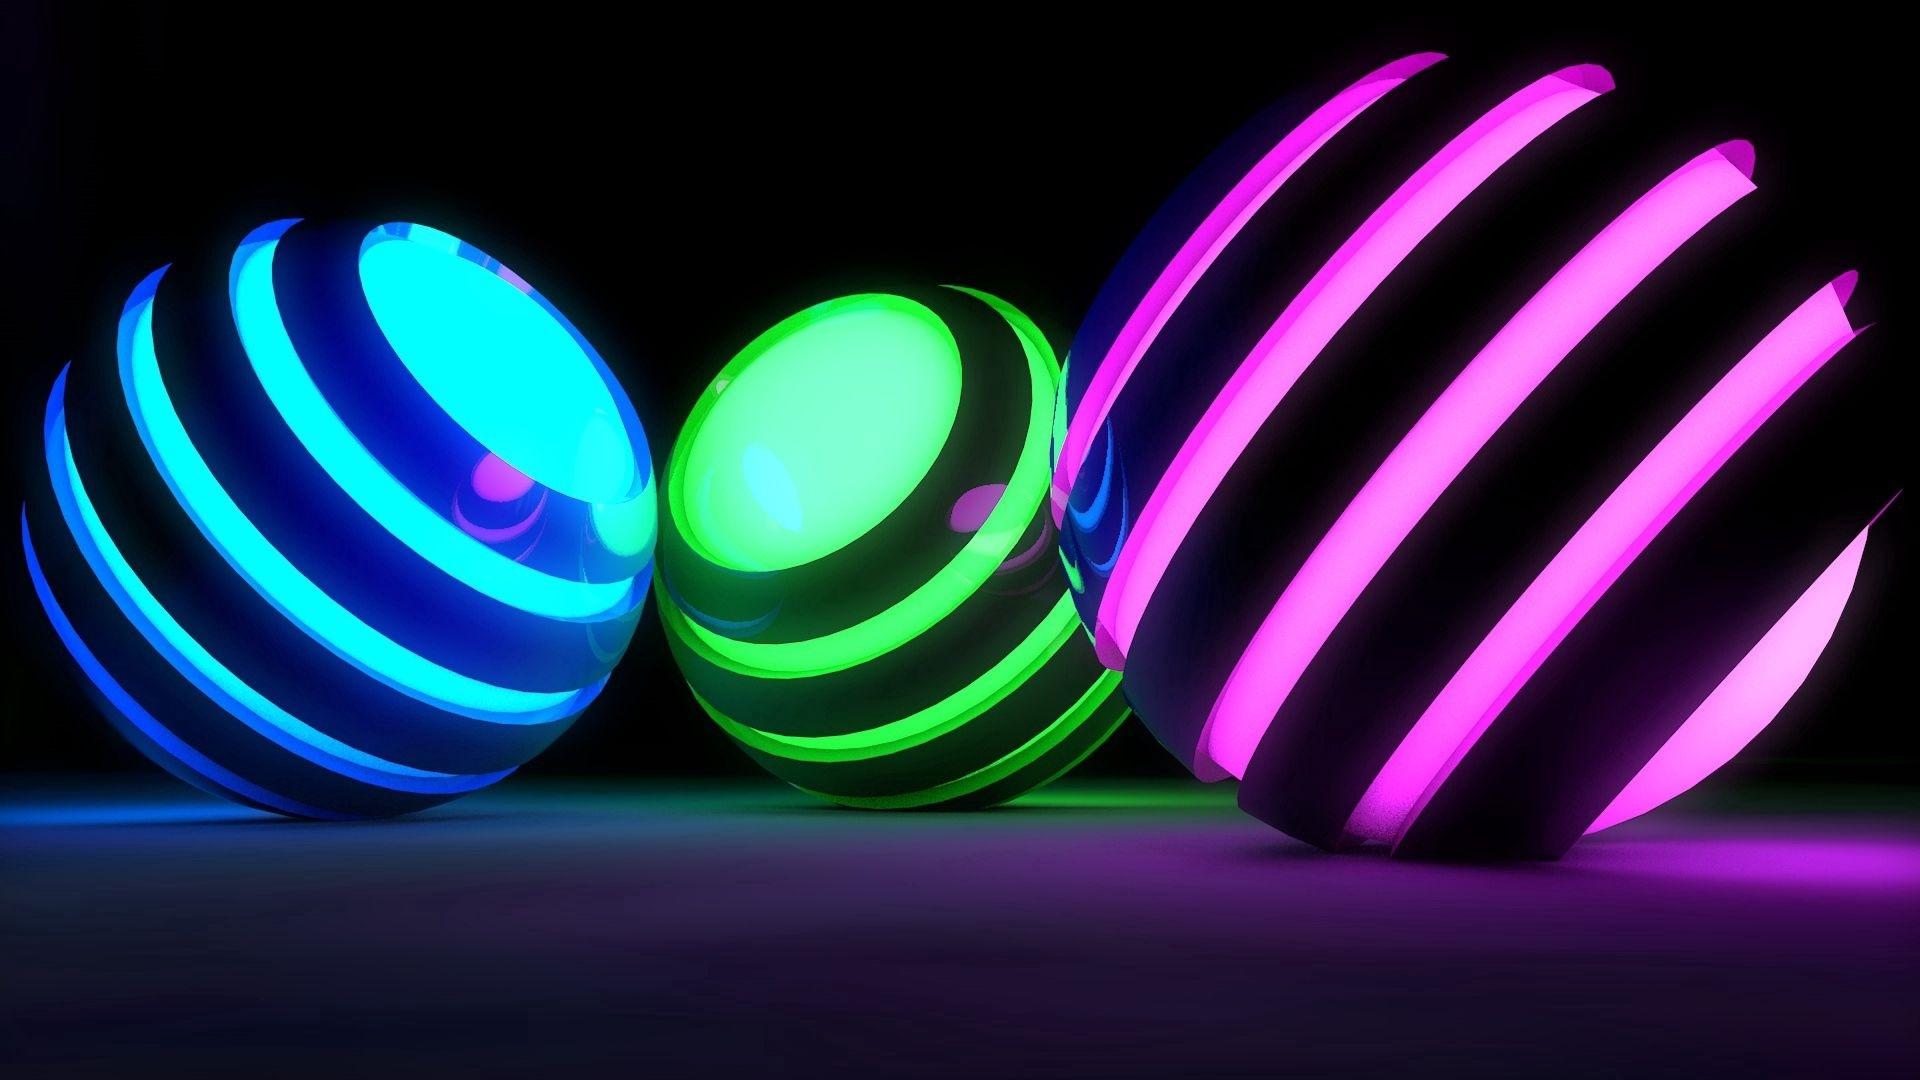 Neon Balloon desktop wallpaper hd